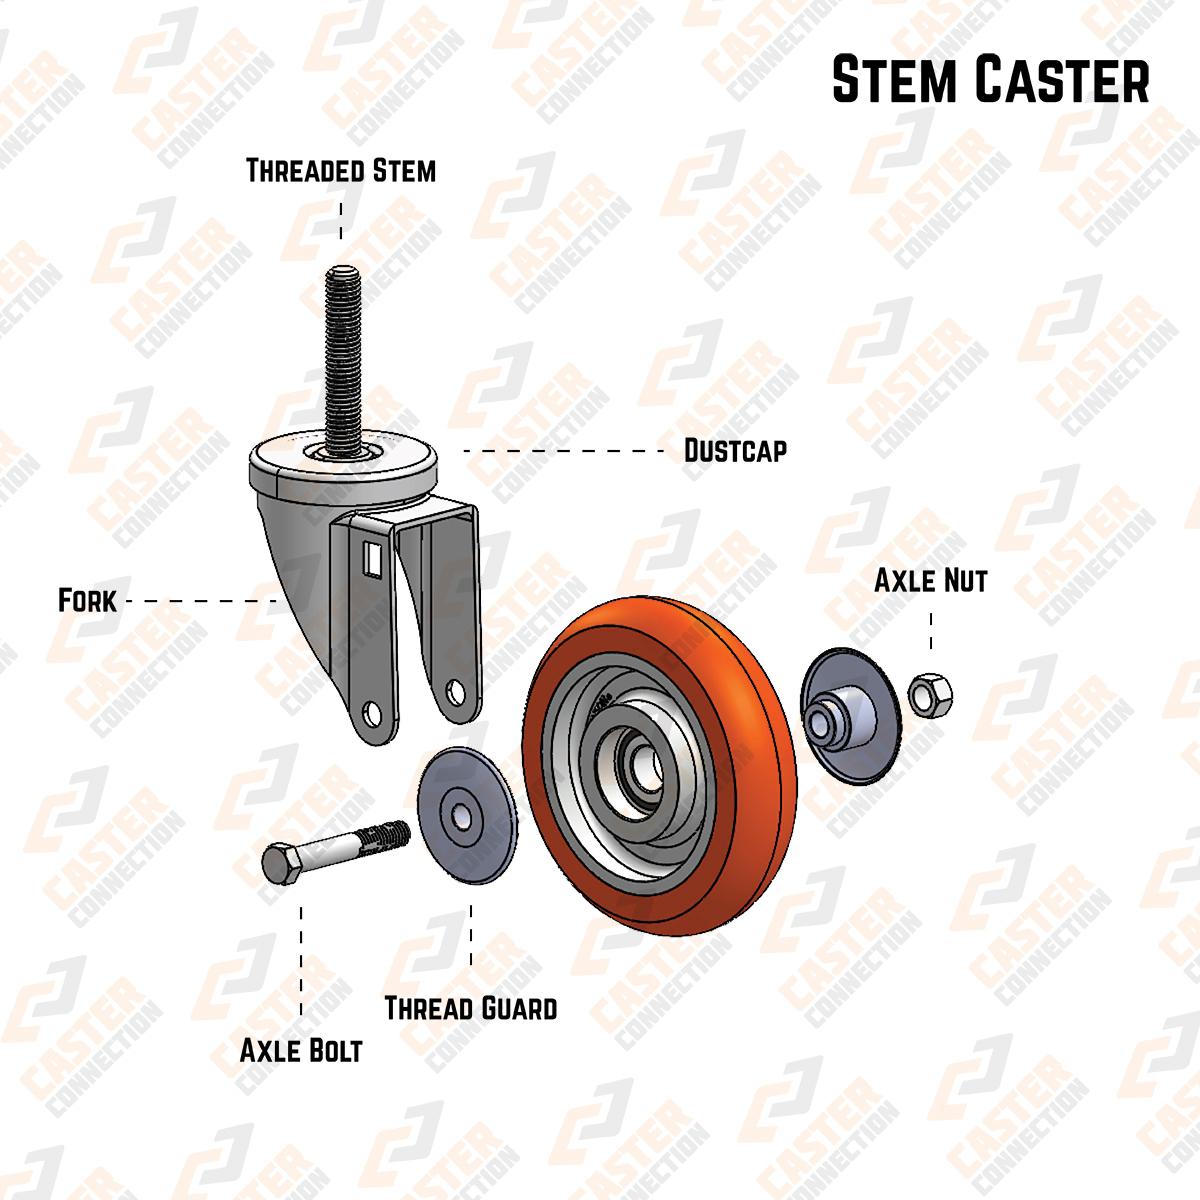 Stem Caster Component Anatomy